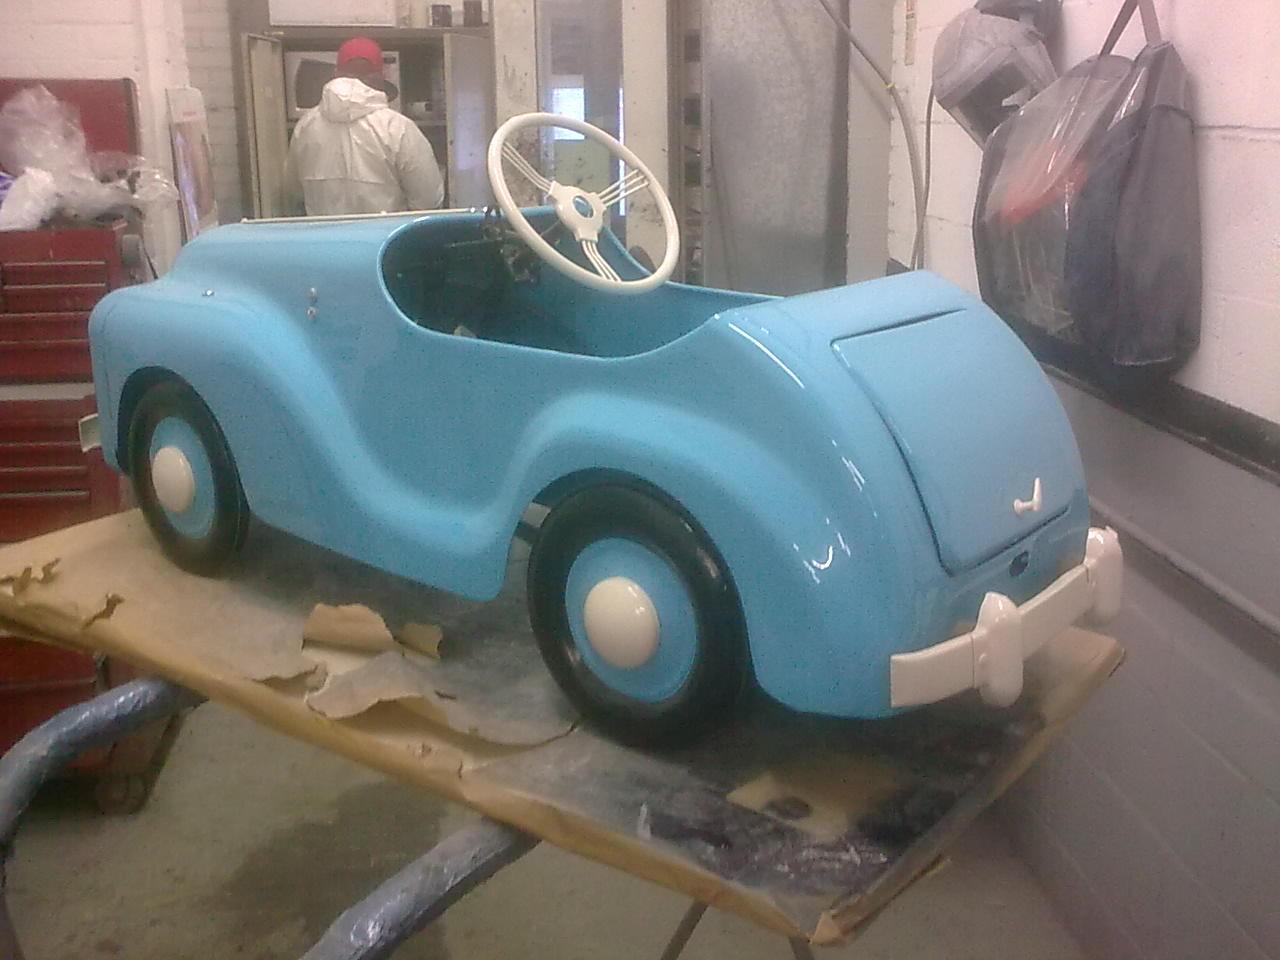 Small Repair. Small Car.   The Body Shop